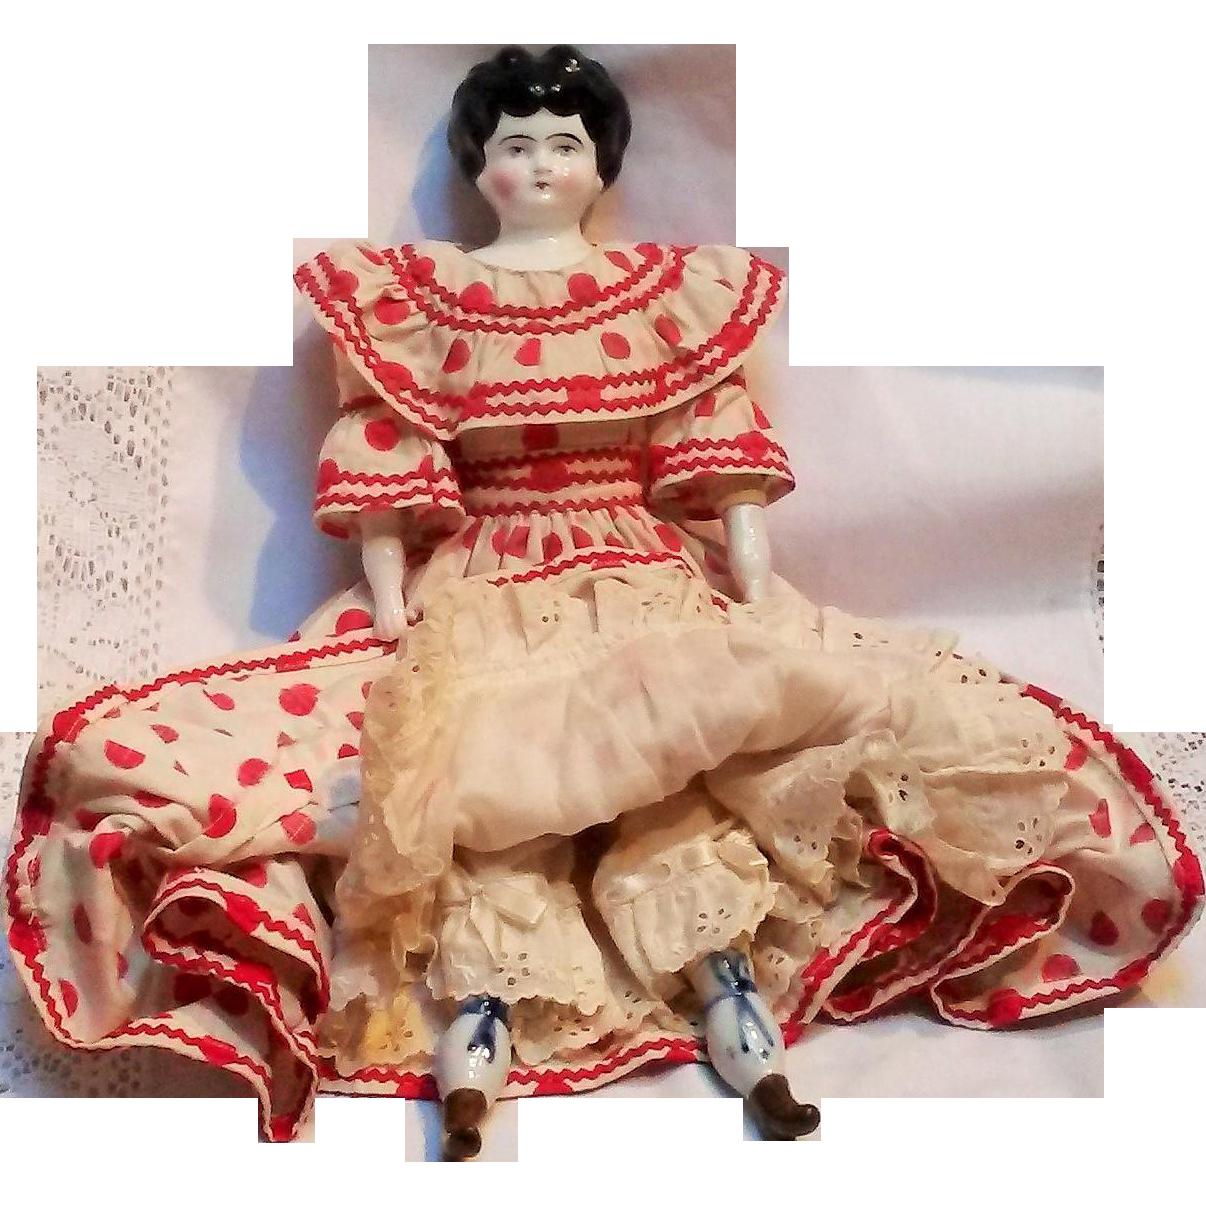 "China head doll Germany  cloth body 14 1/2"" red polka dot dress"